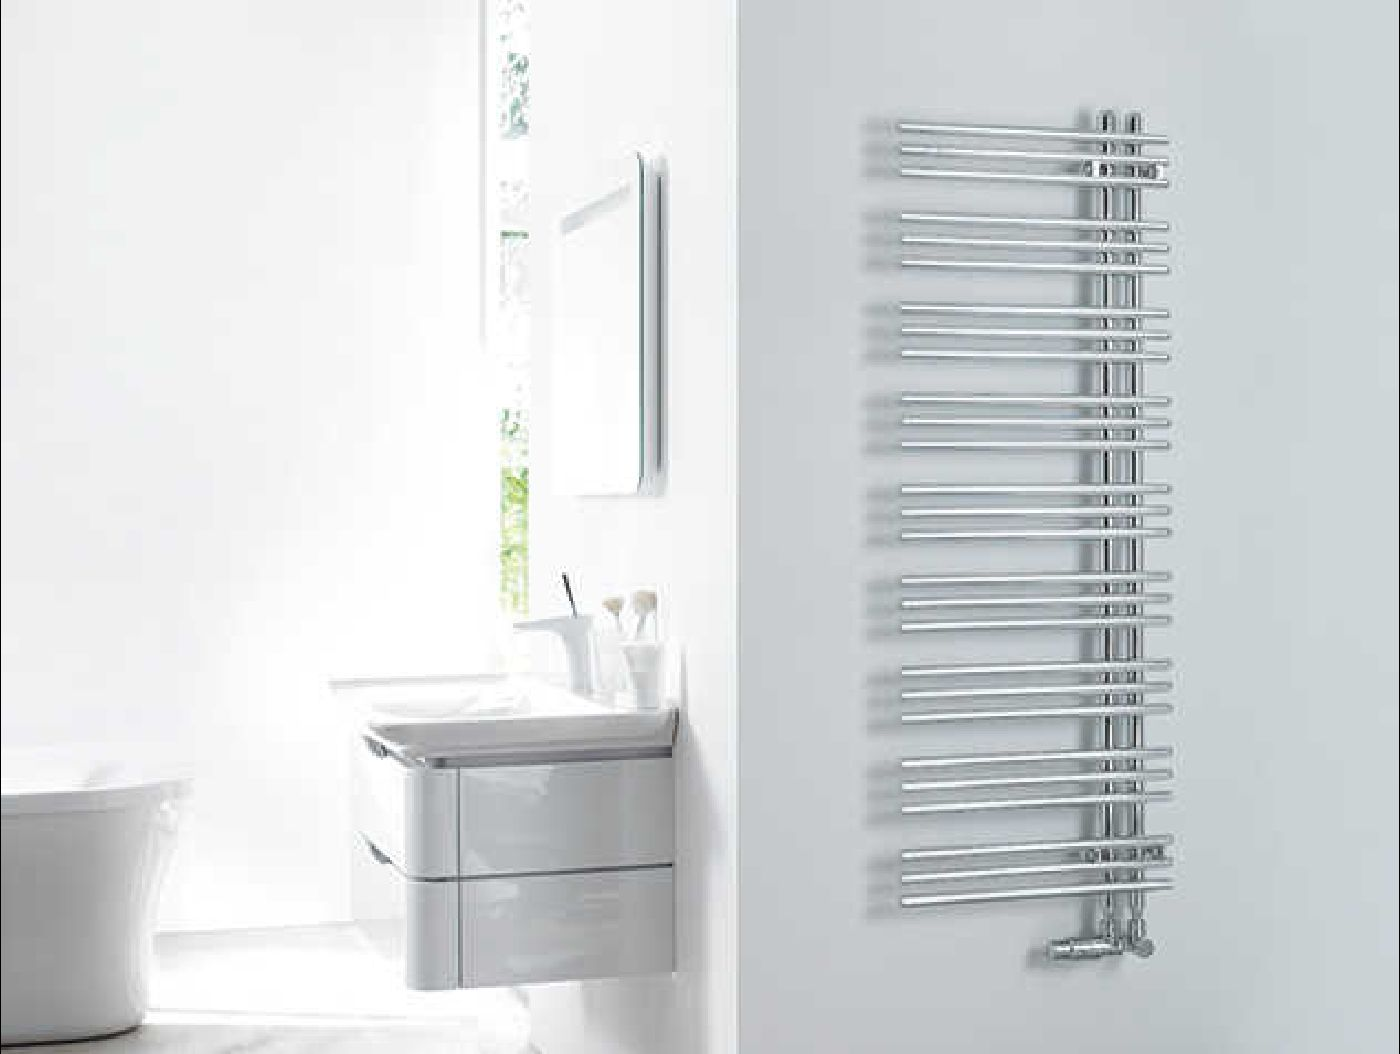 Radiator Voor Toilet : Radiatoren bodenheizung heizung nordwestschweiz u gersbach ag